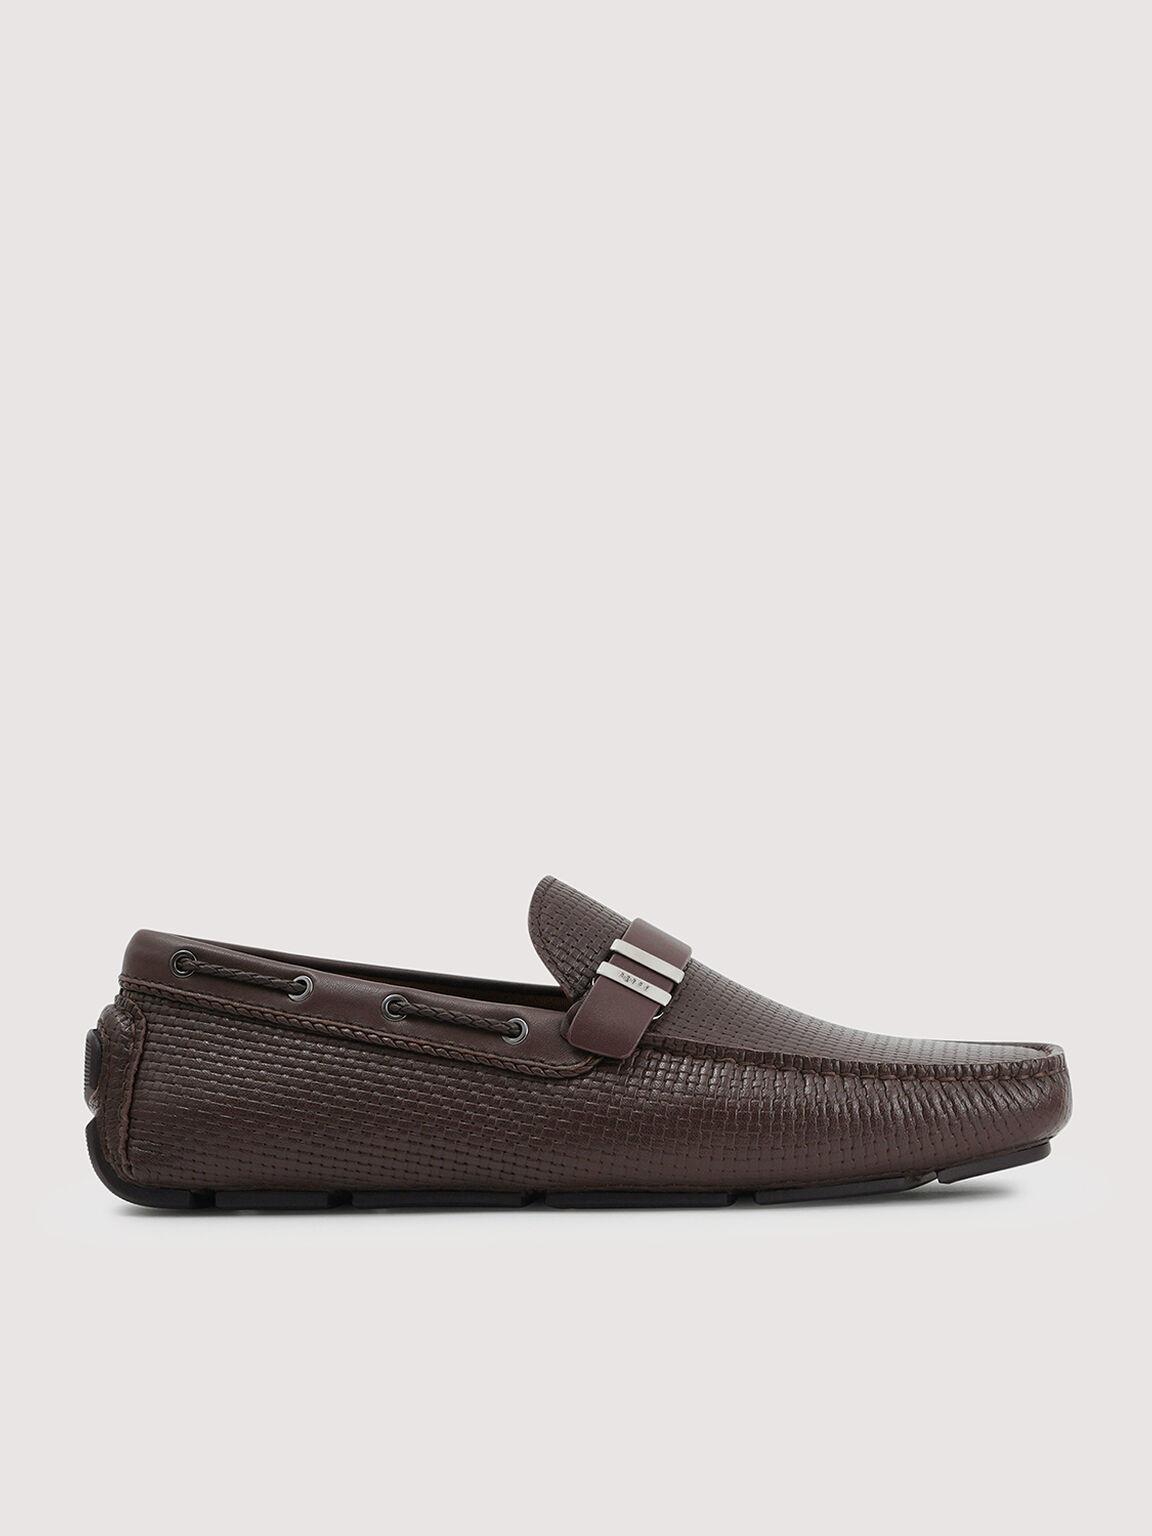 Embossed Buckled Leather Moccasin, Dark Brown, hi-res